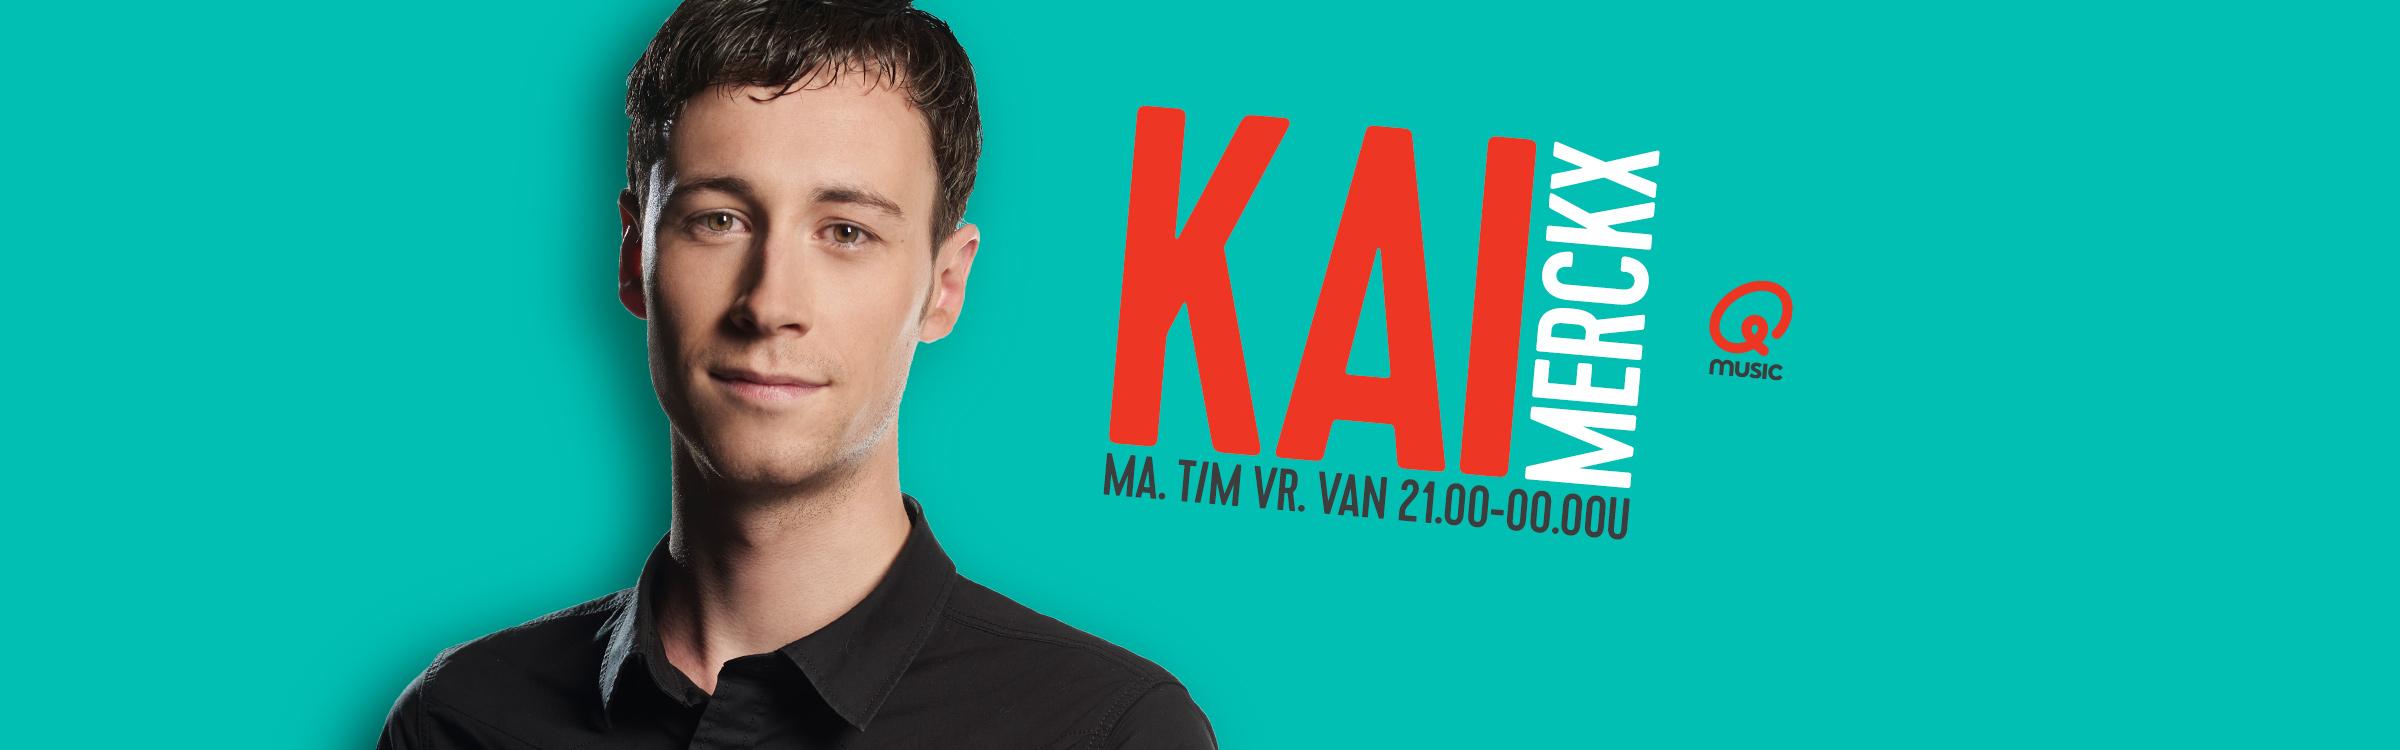 Kai header